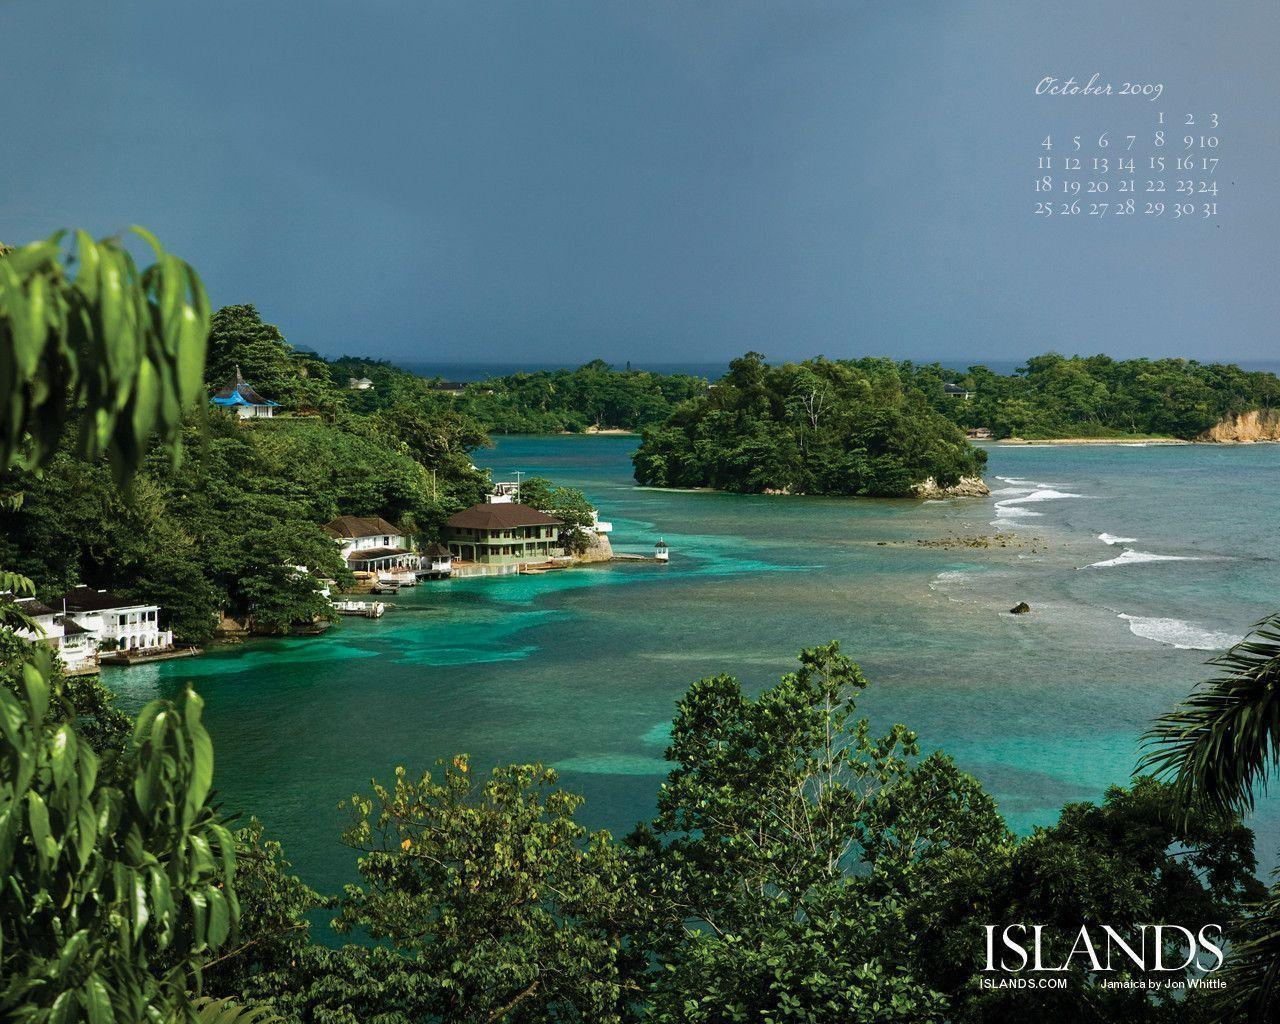 caribbean island postcard wallpaper - photo #4